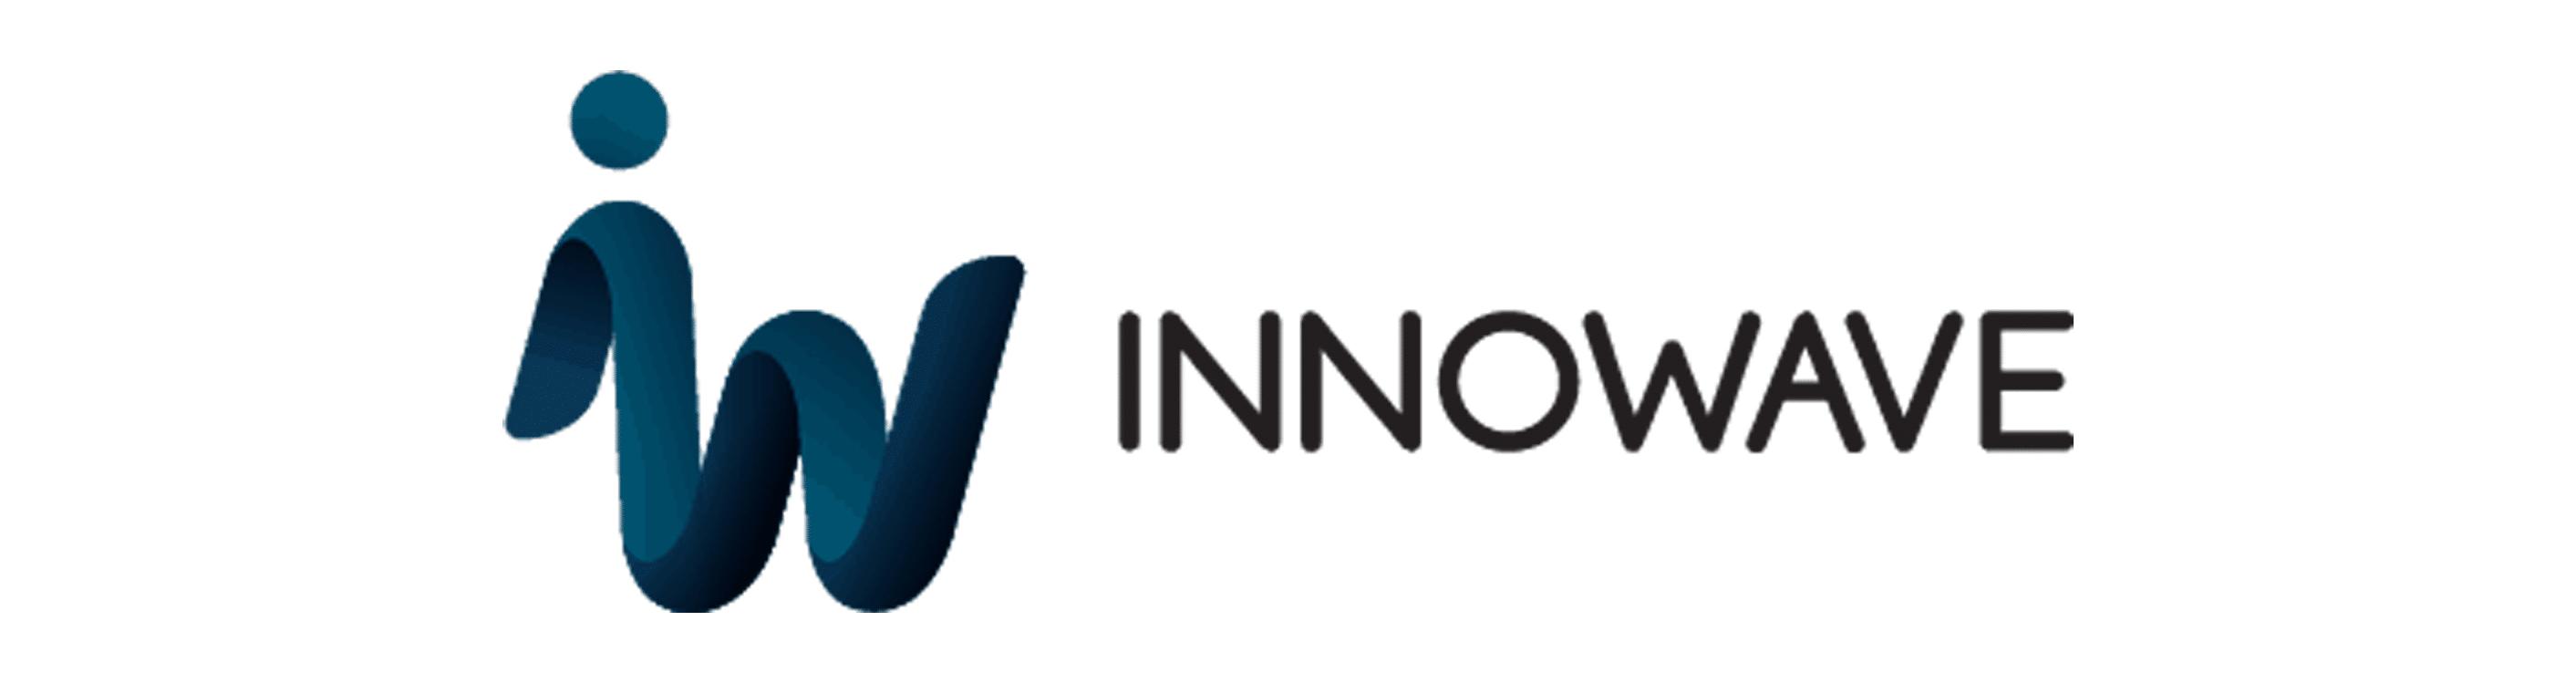 Innowave Logo